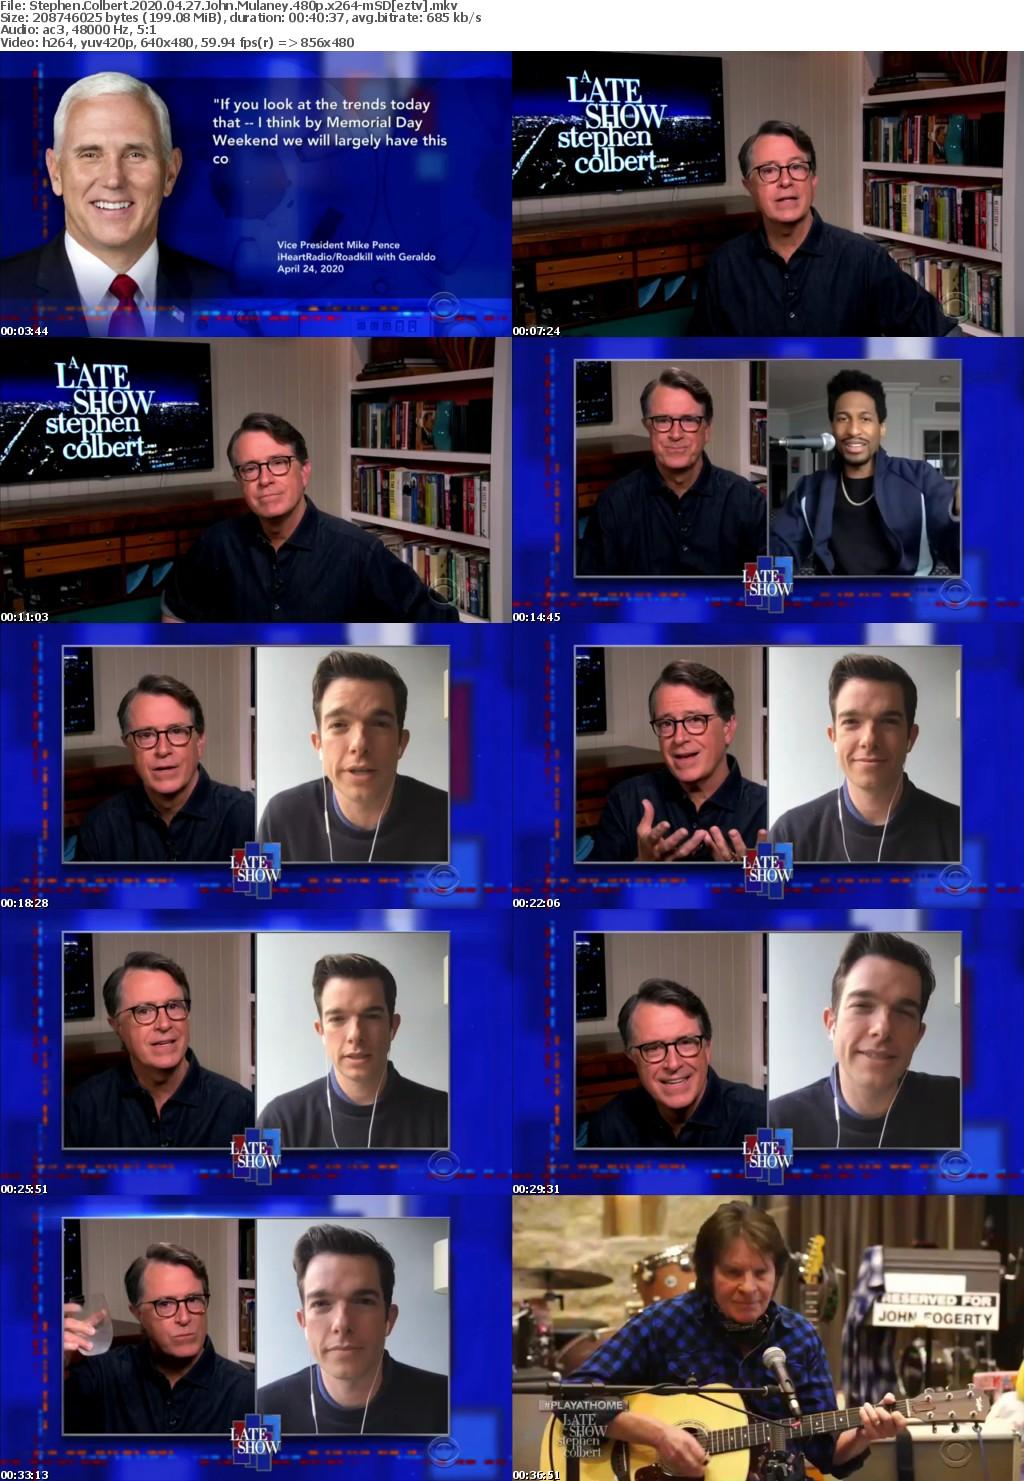 Stephen Colbert 2020 04 27 John Mulaney 480p x264-mSD